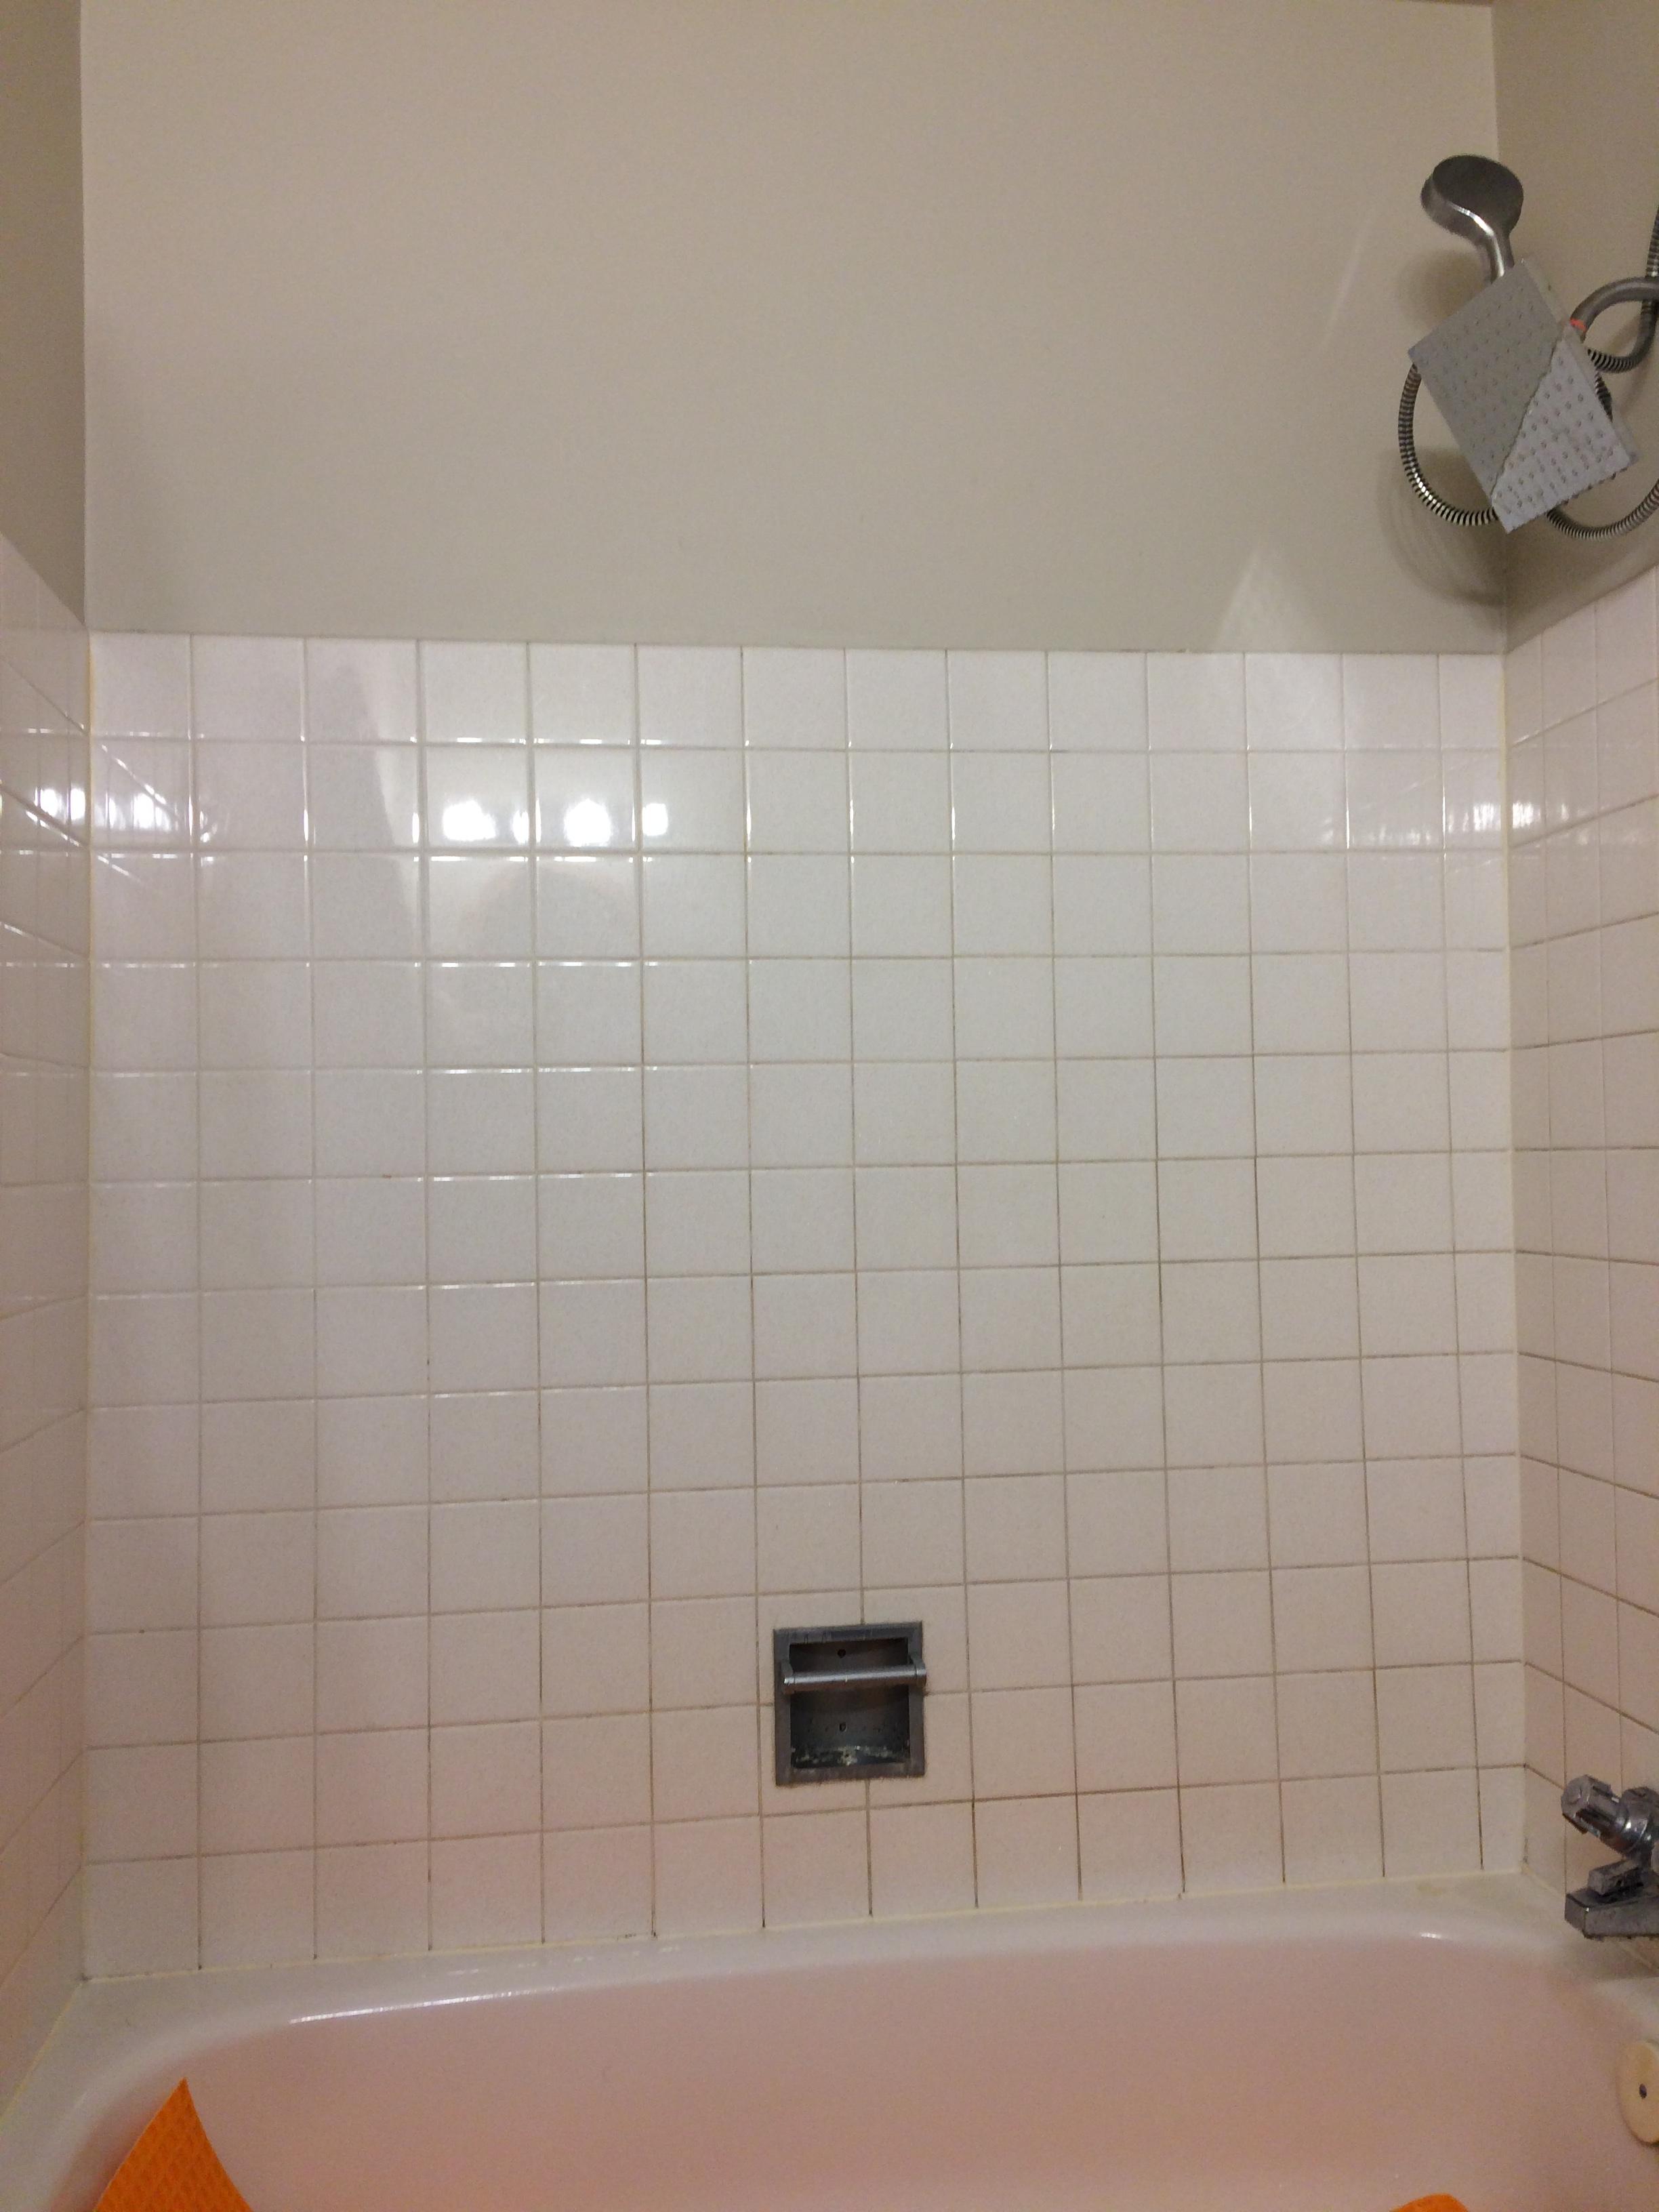 Bathroom tub surround reno (before)